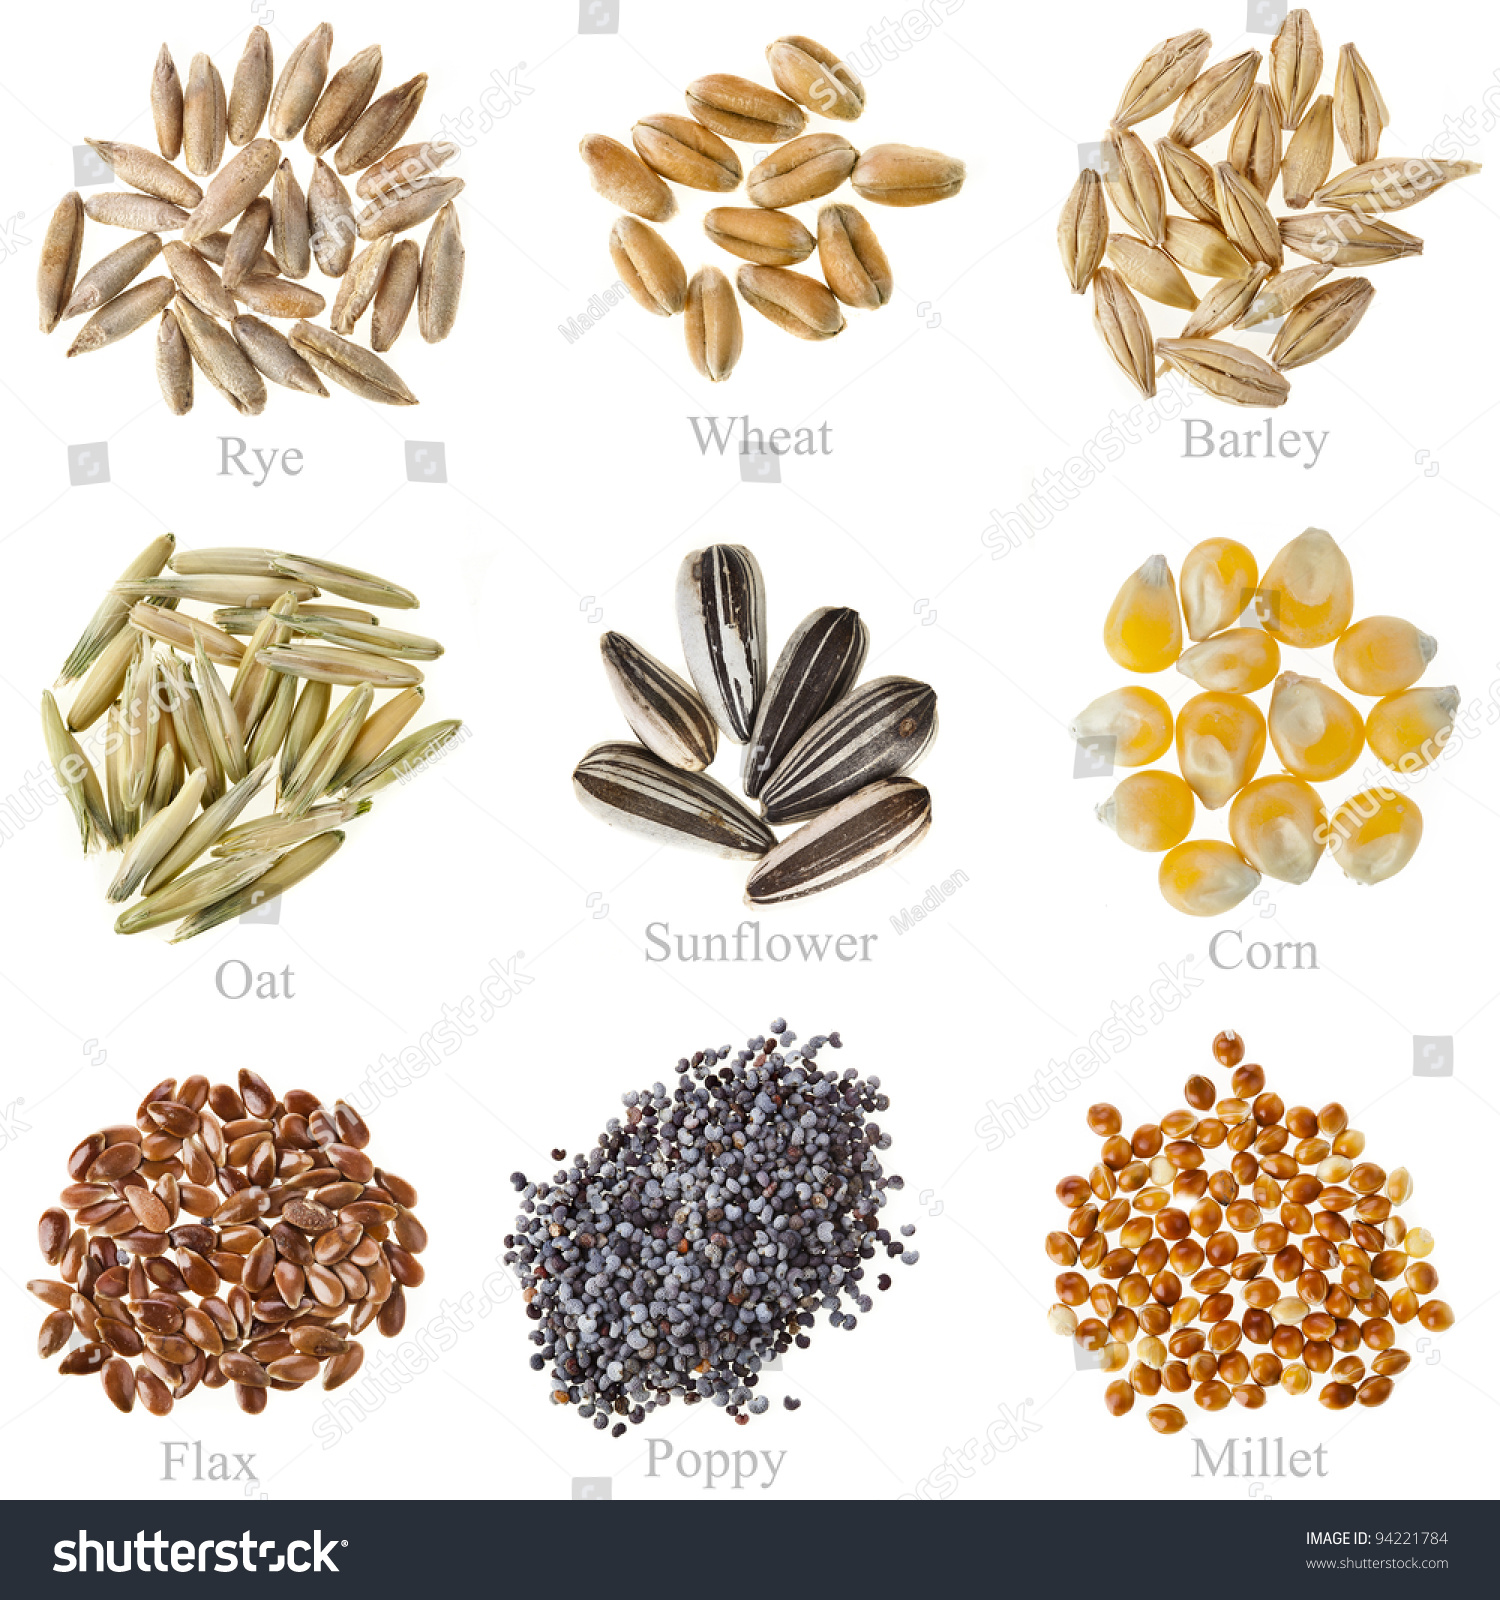 8ca40b339 دليلك الشامل لكل أنواع الحبوب - منتدى فتكات